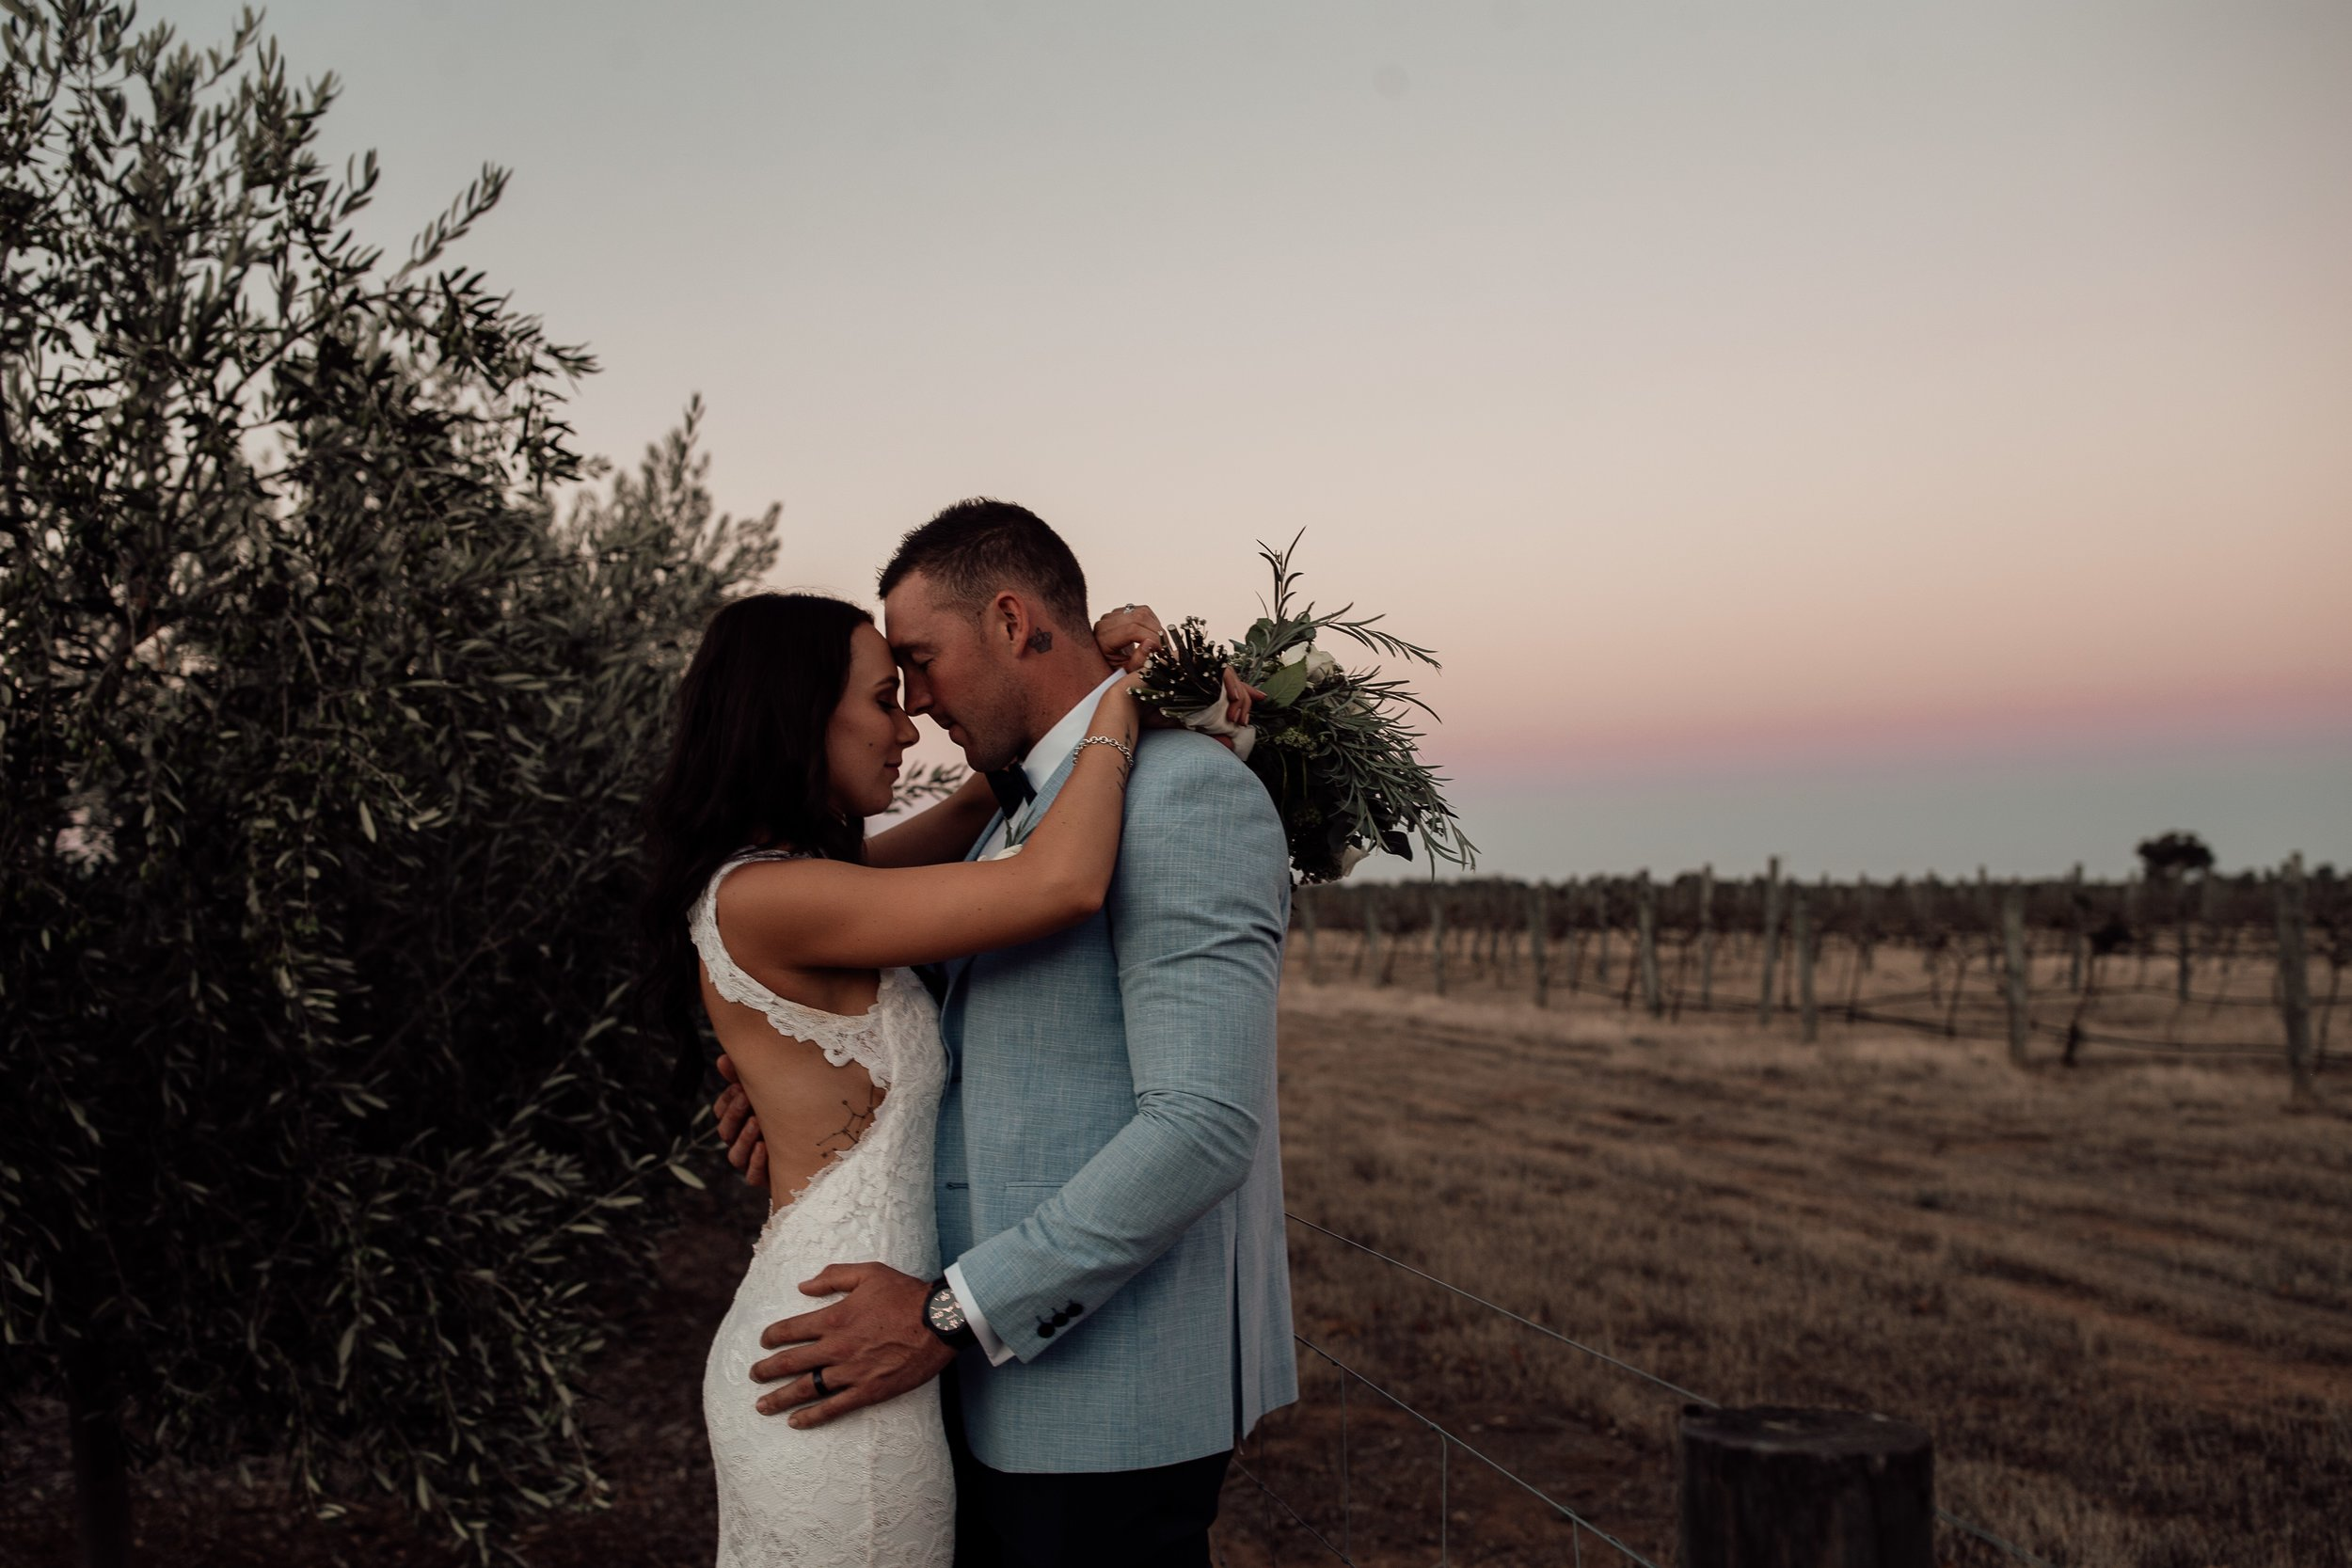 mickalathomas_puremacphotography_weddingphotographer_couplephotographer_Sheppartonphotographer_2933.jpg